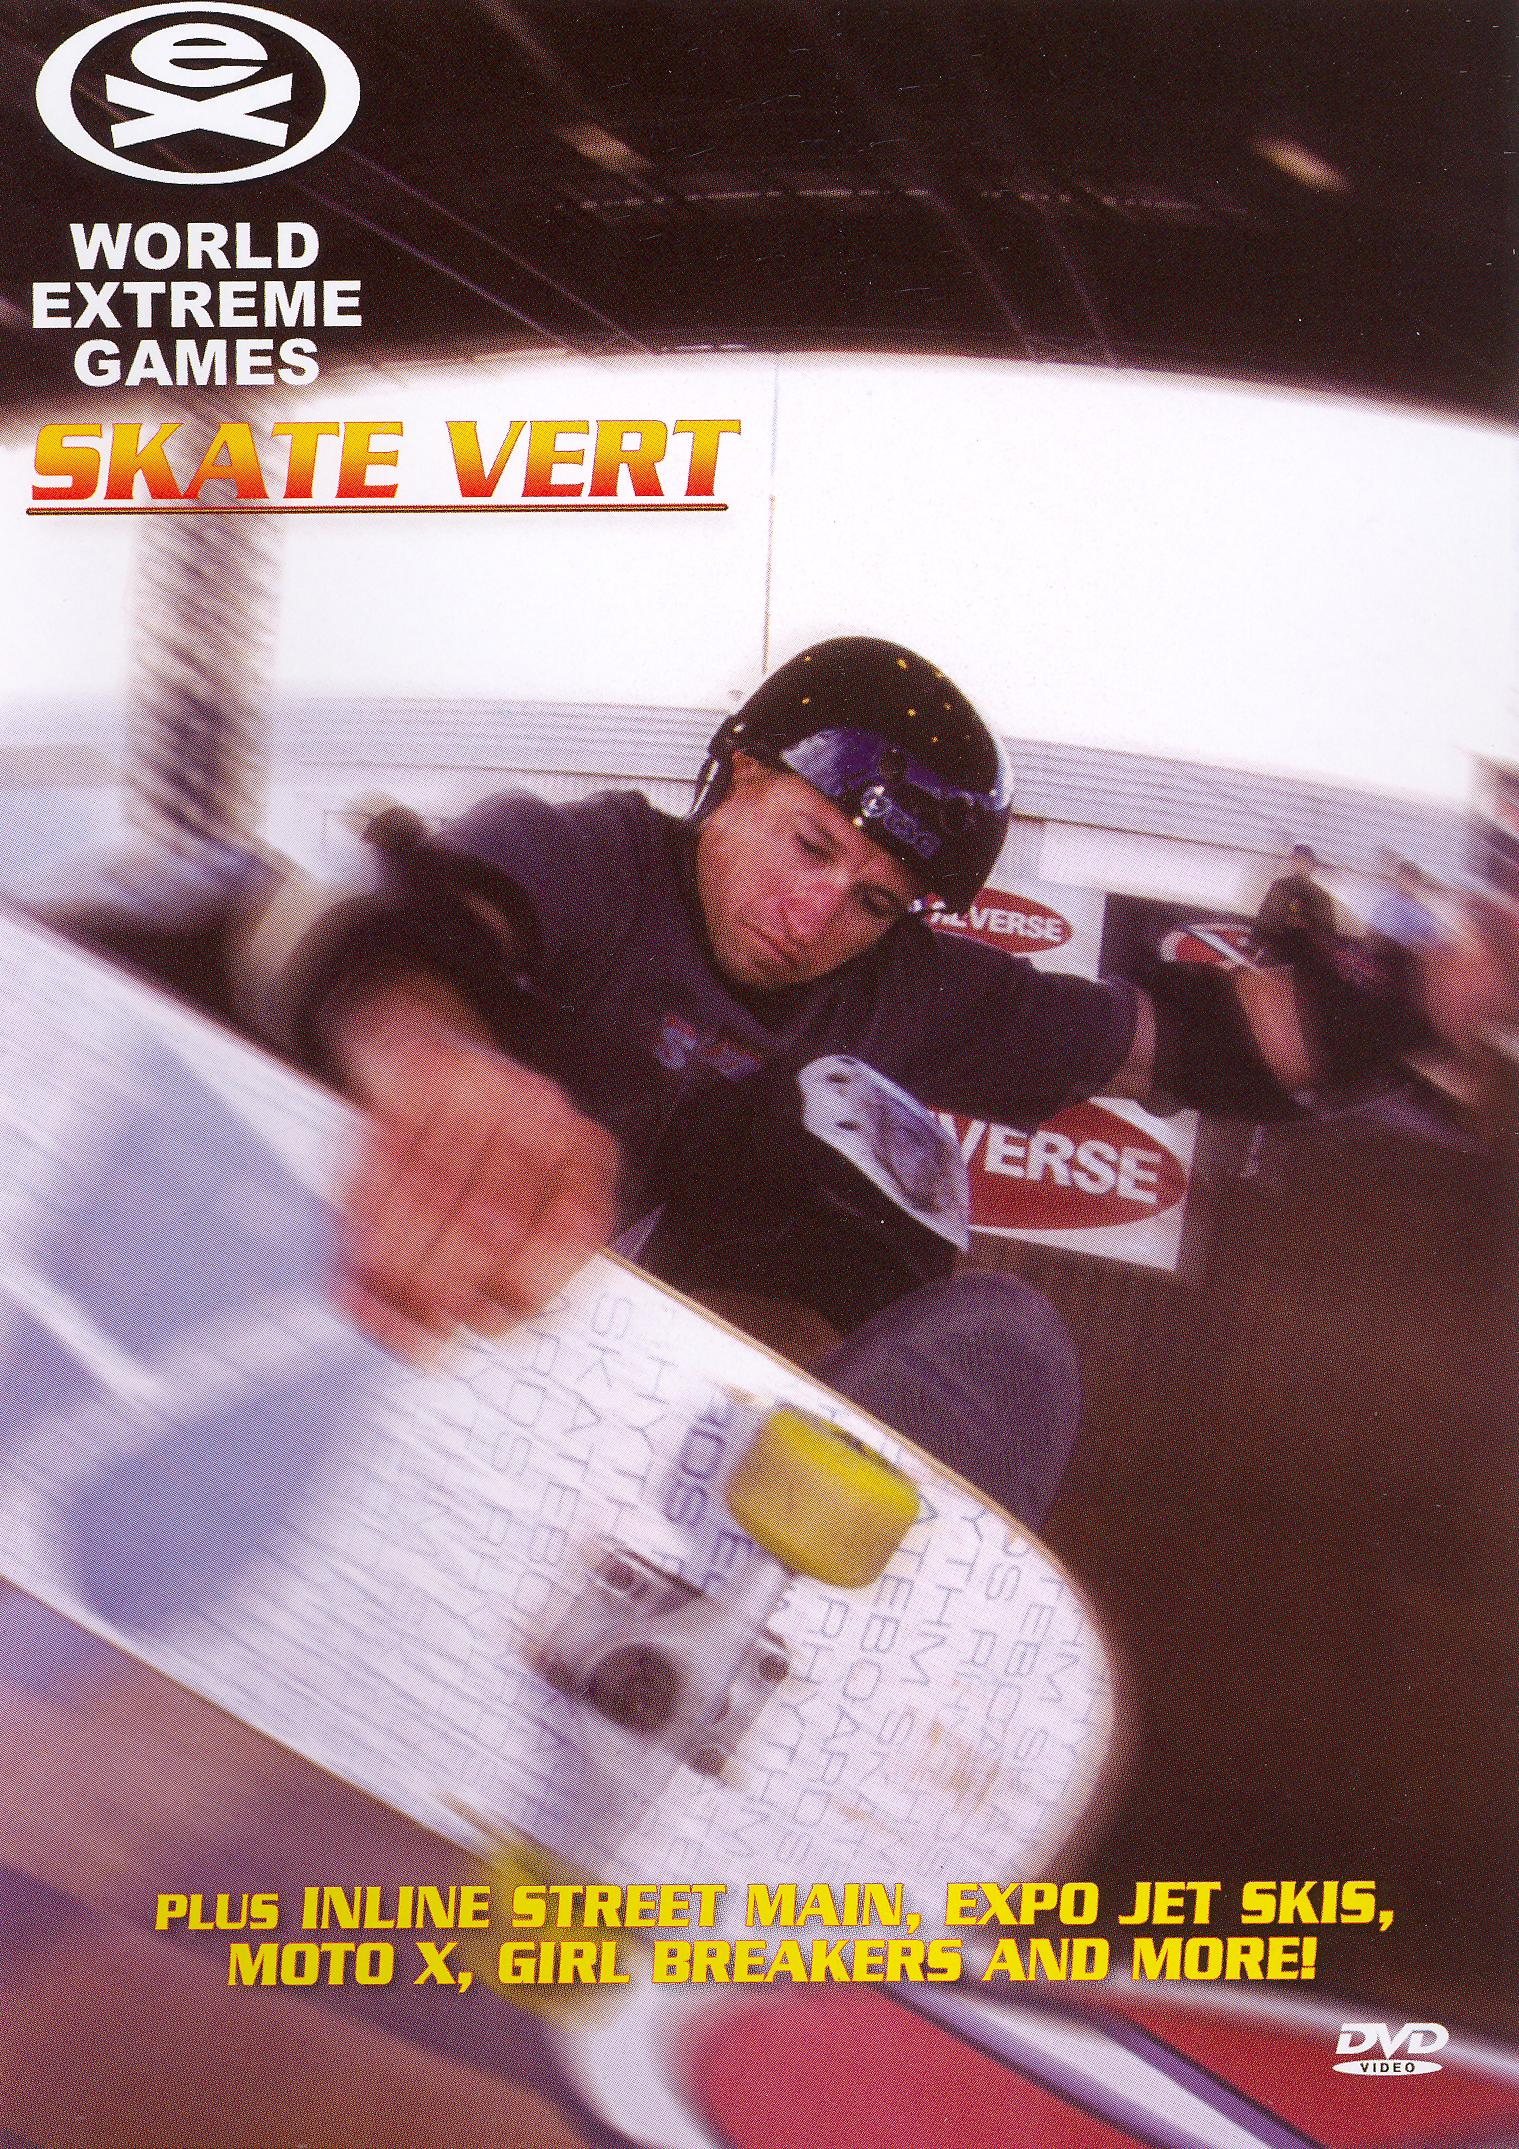 World Extreme Games, Vol. 2